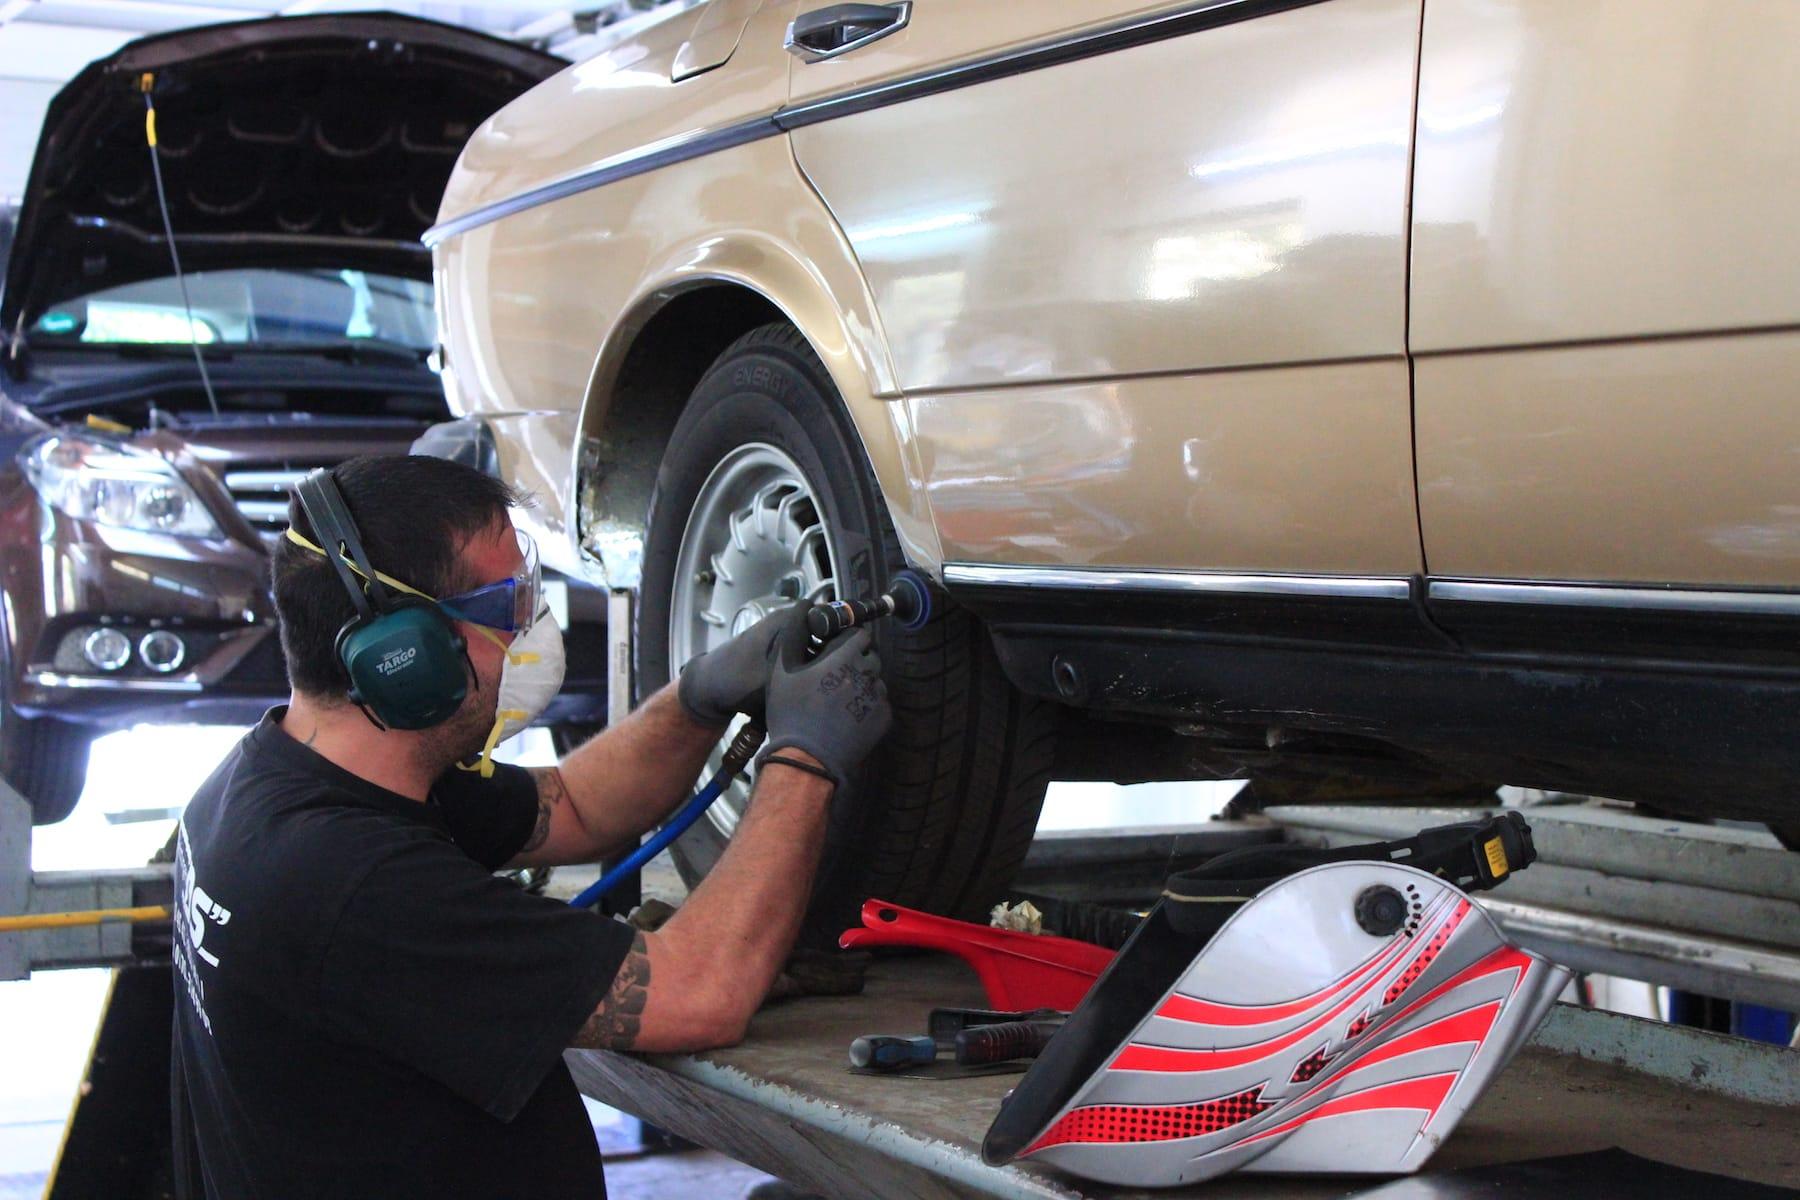 KFZ Reparaturen in Mölln - Autoservice Mirus